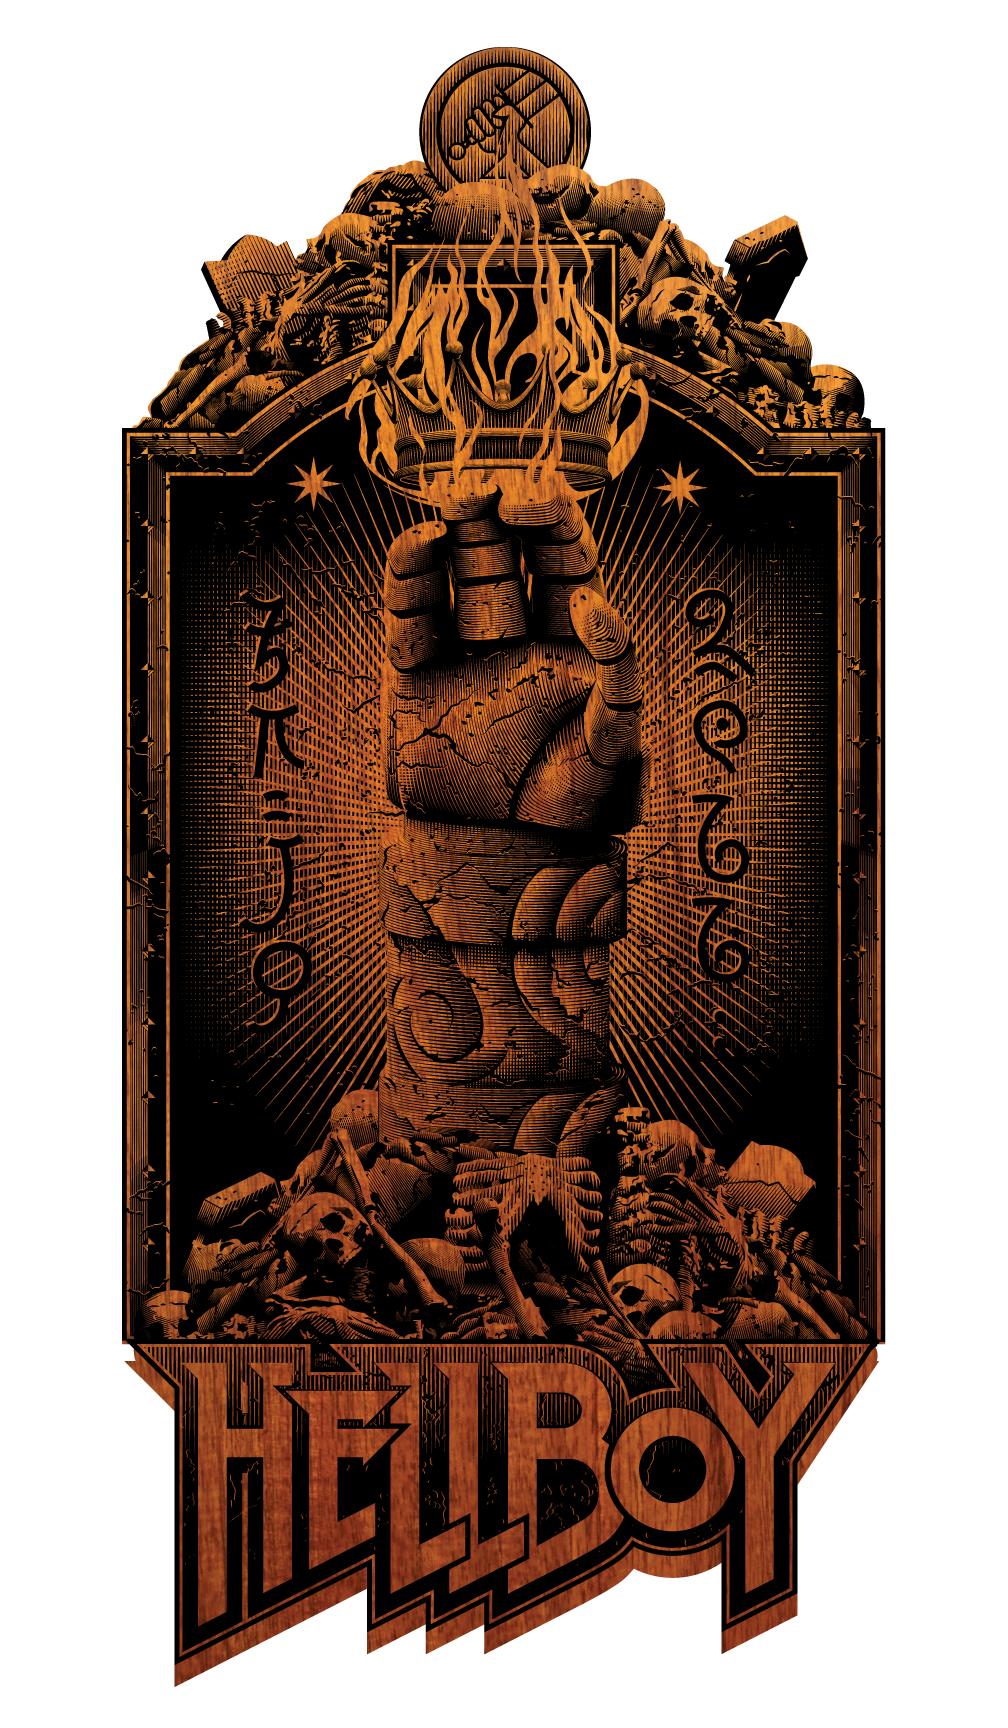 tching-hellboy20thanniv-engravingmockup-copy.png (1008×1728)